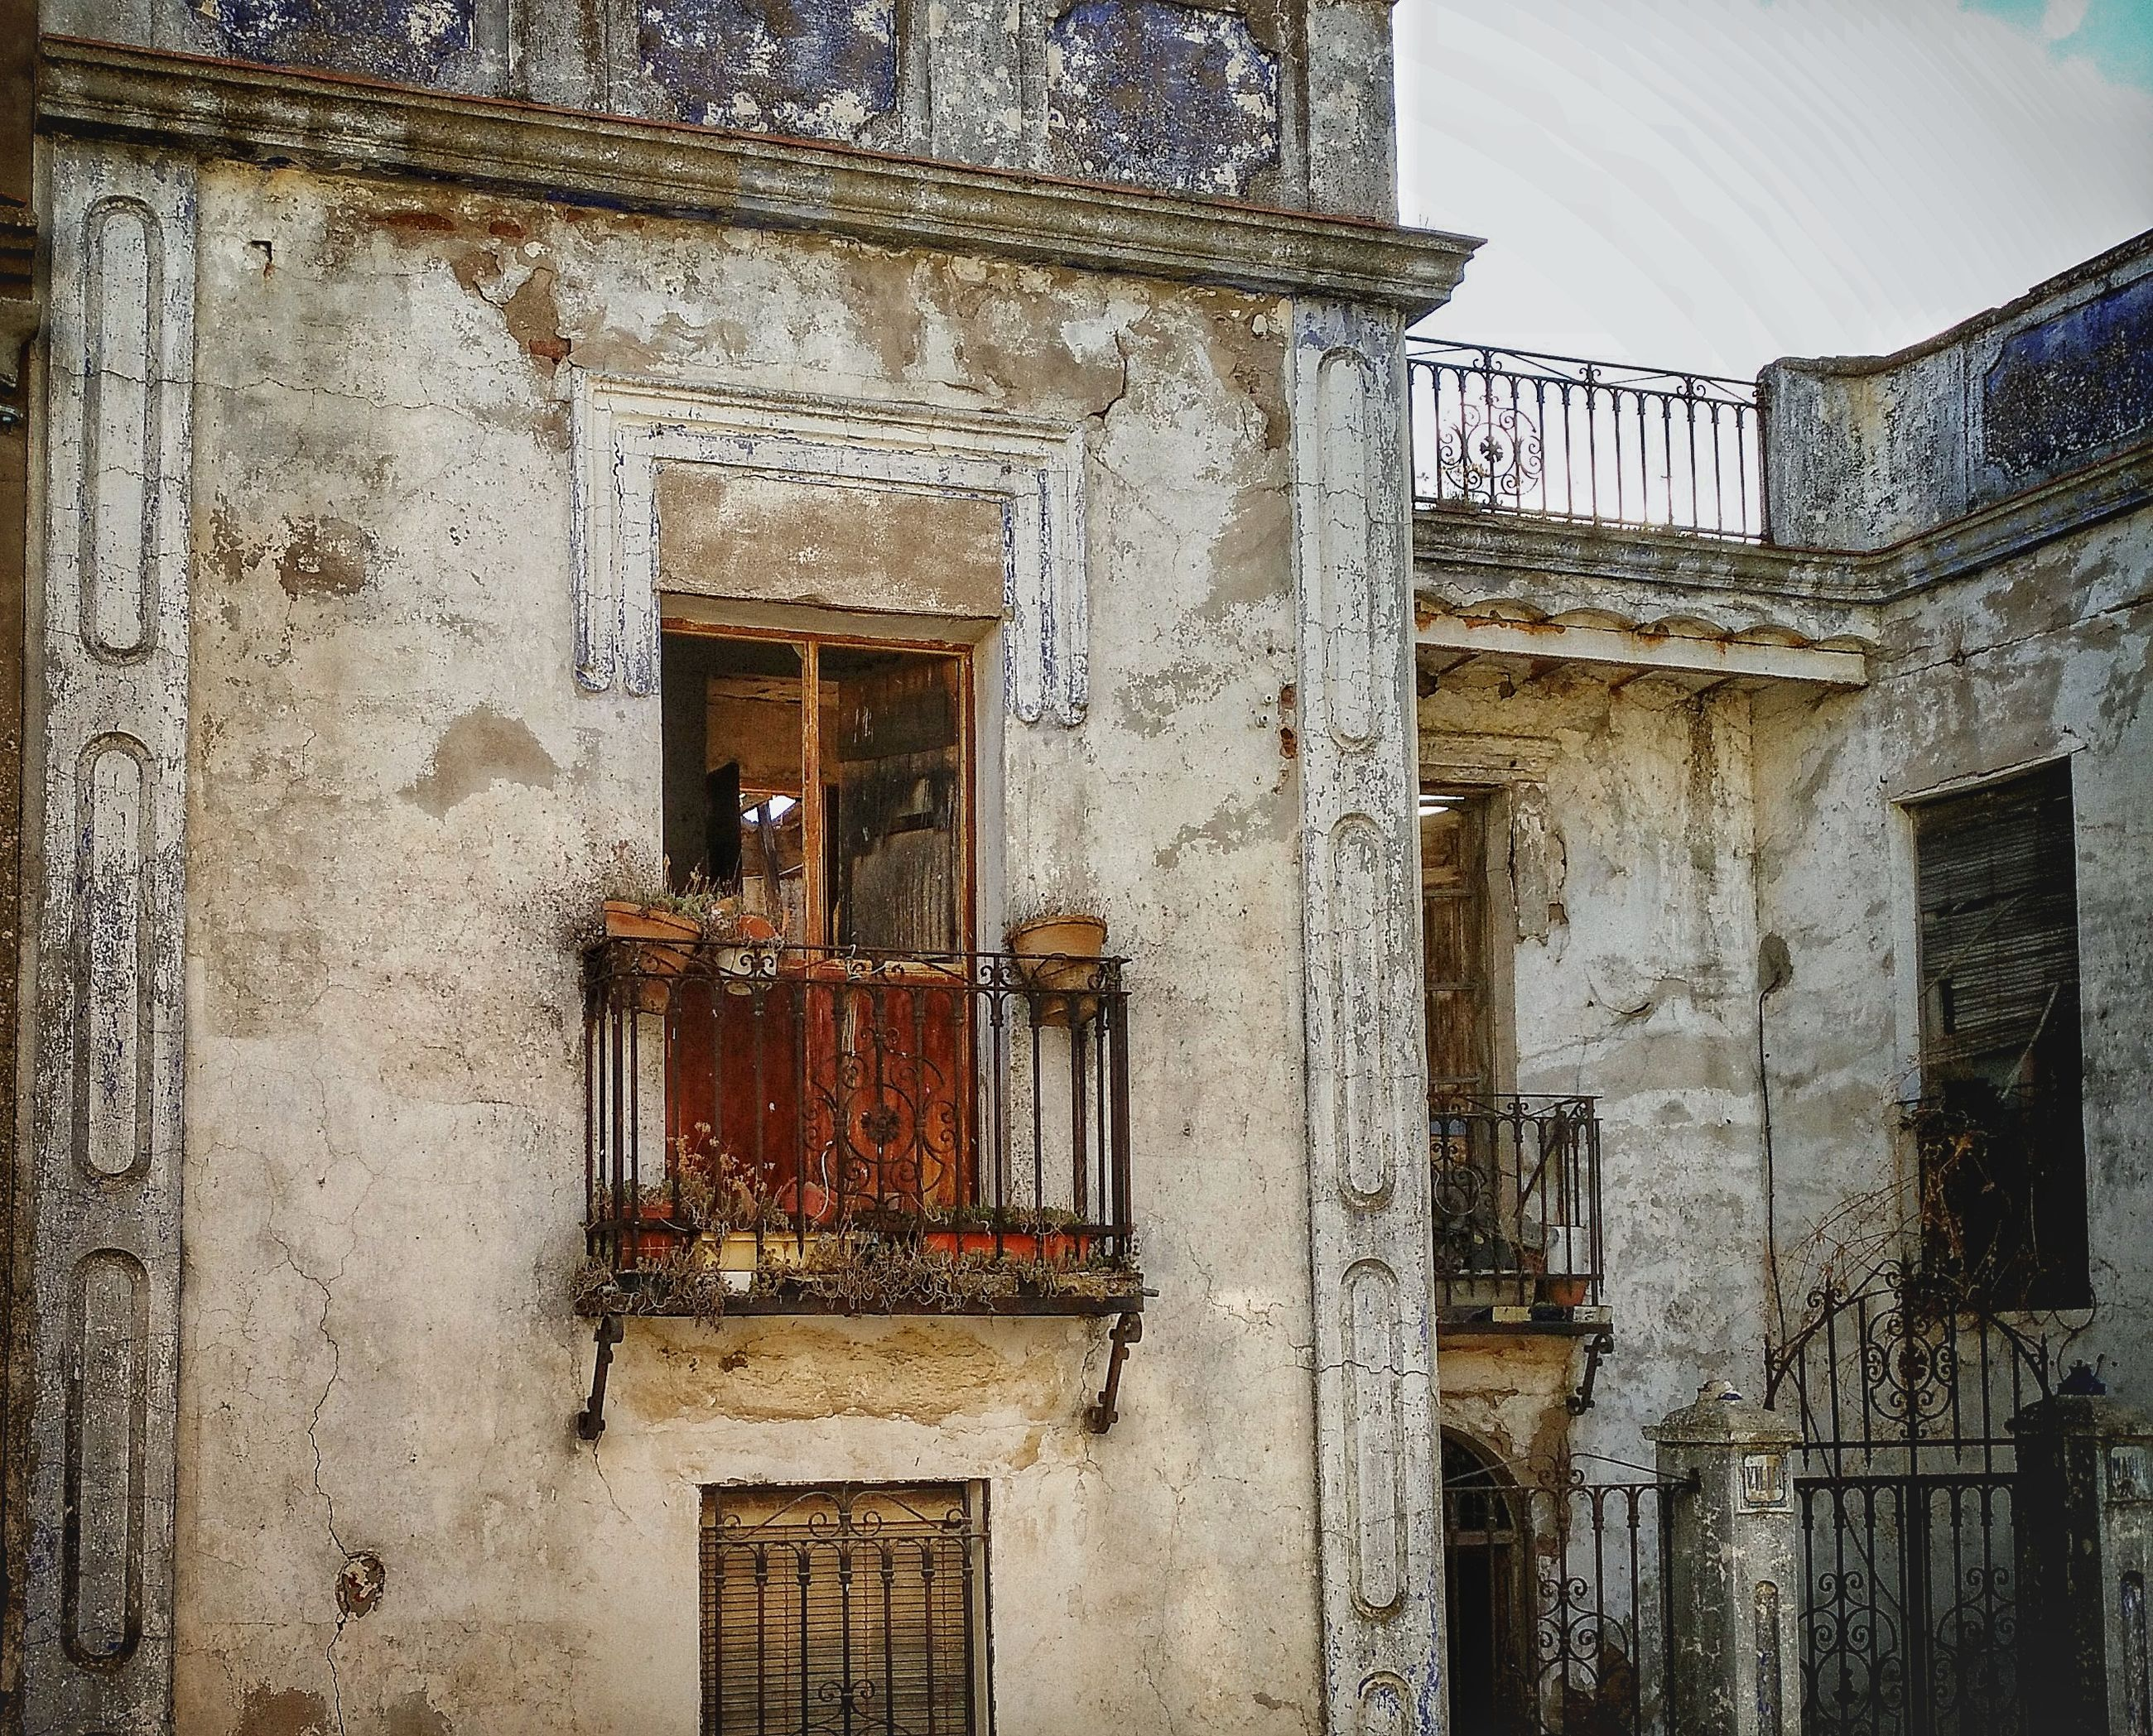 architecture, building exterior, built structure, window, door, no people, outdoors, day